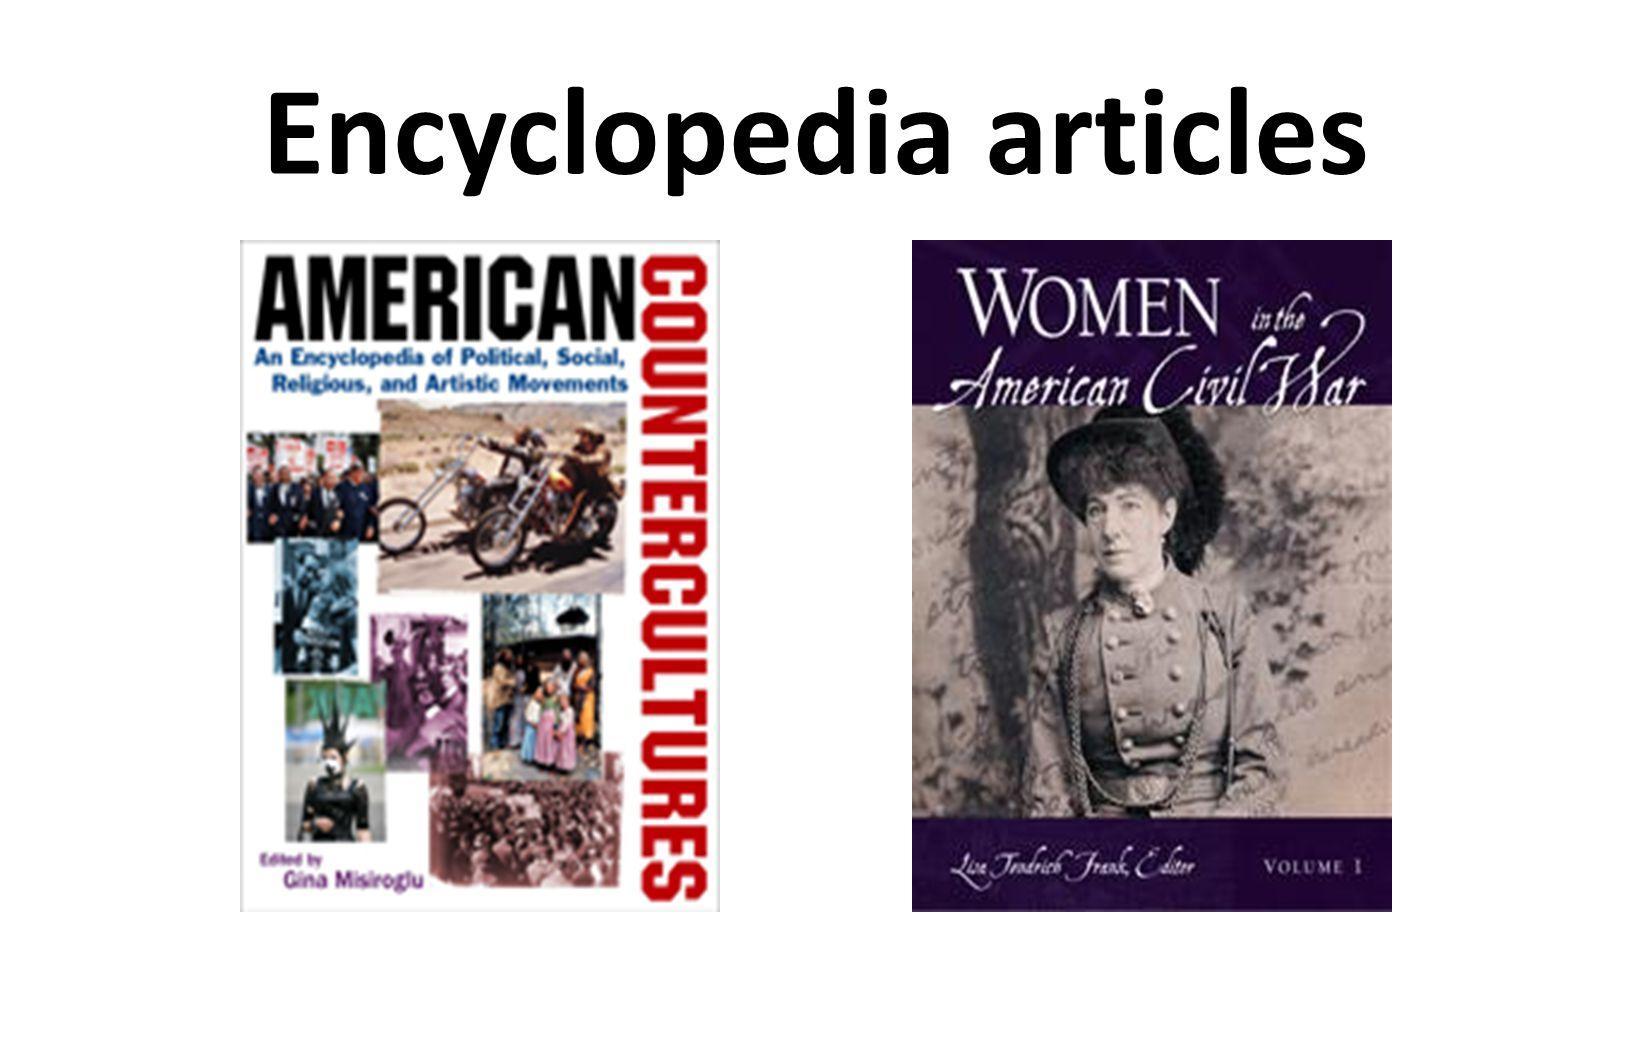 Encyclopedia articles